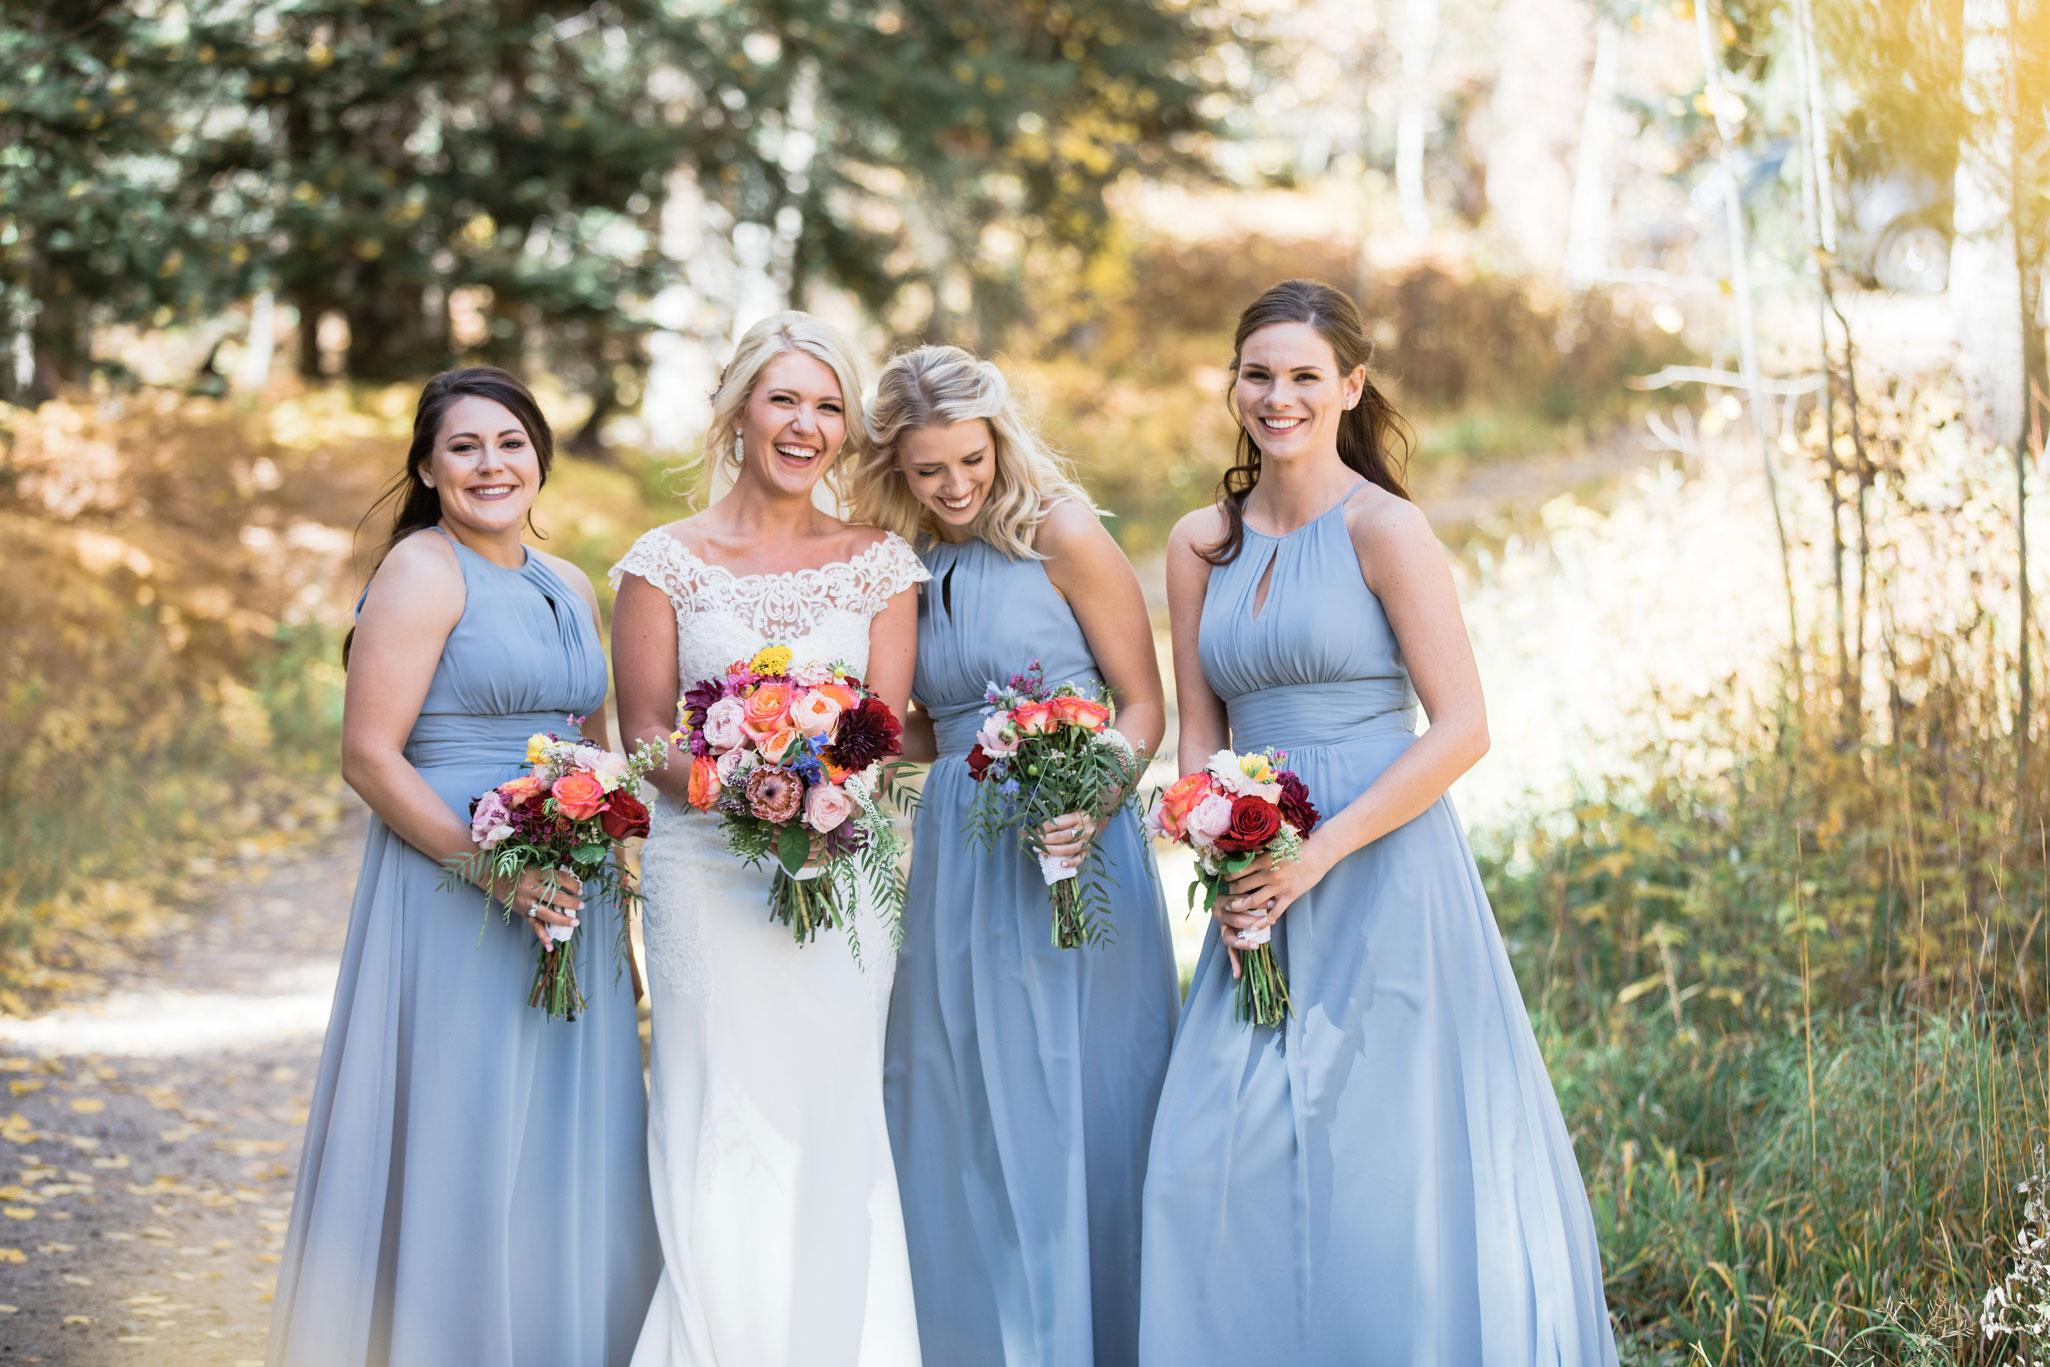 Cascade Village weddings, Durango, Colorado